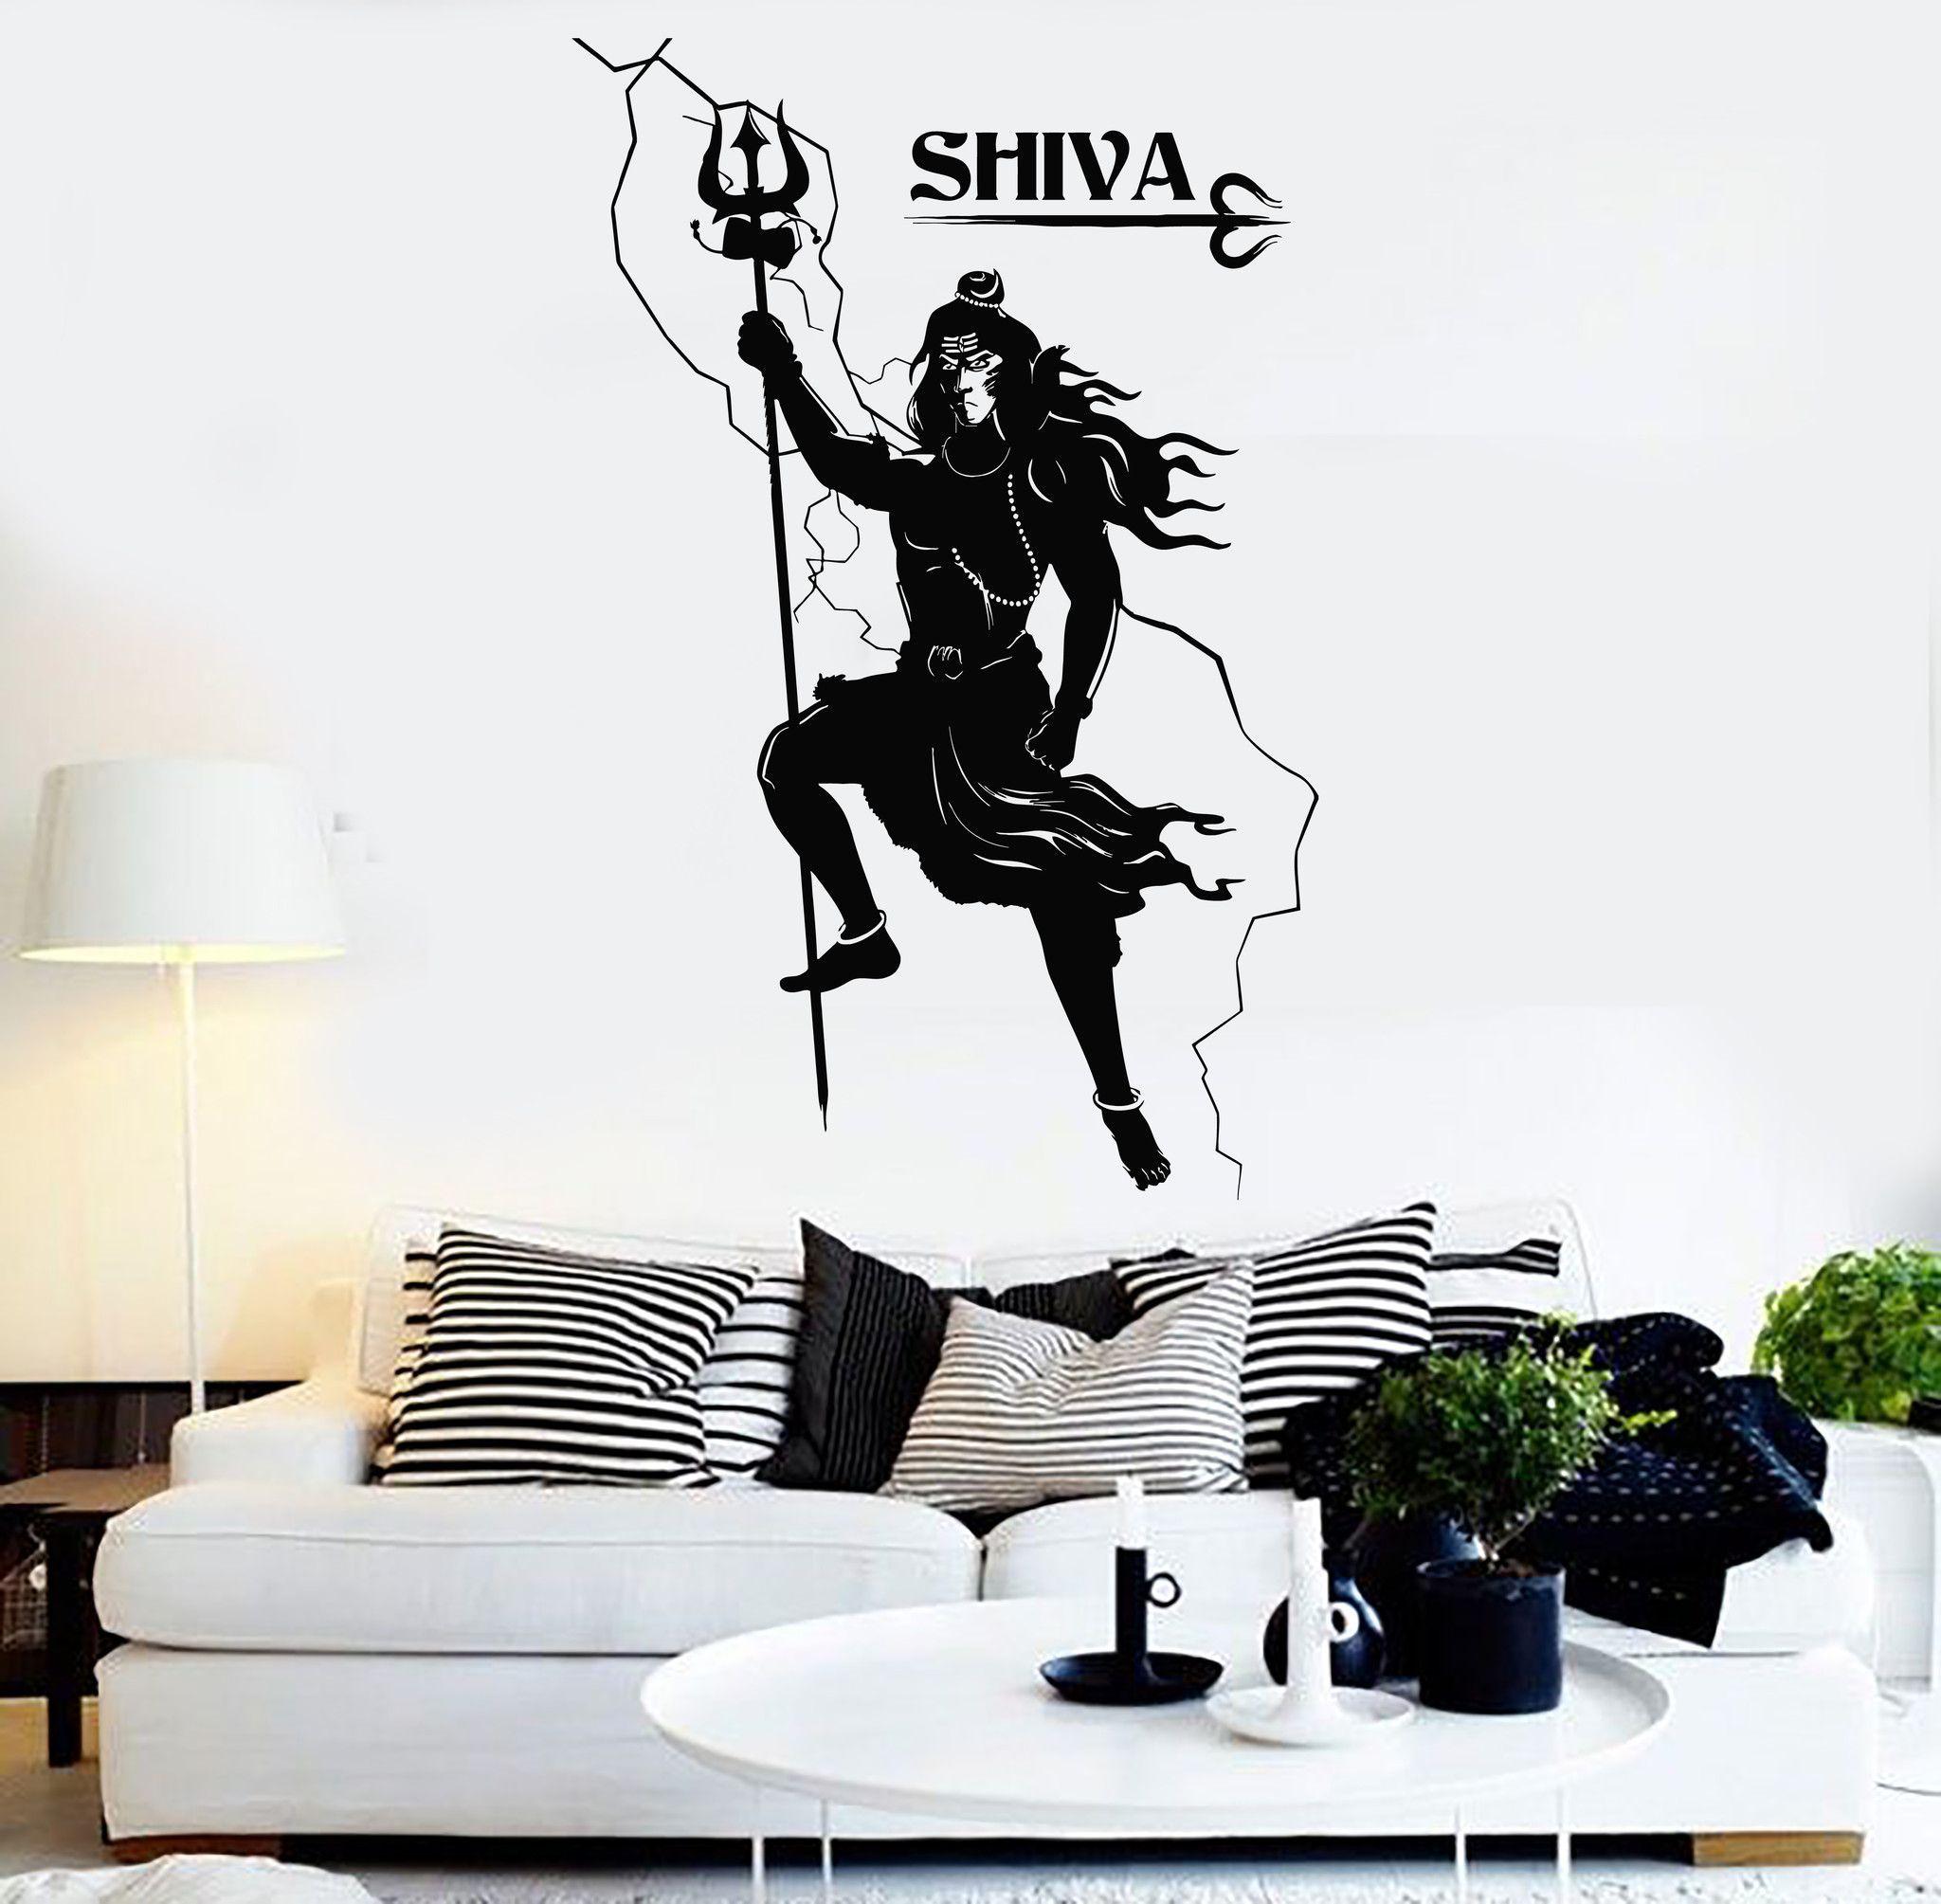 Vinyl Wall Decal Shiva Hinduism Indian God India Hindu